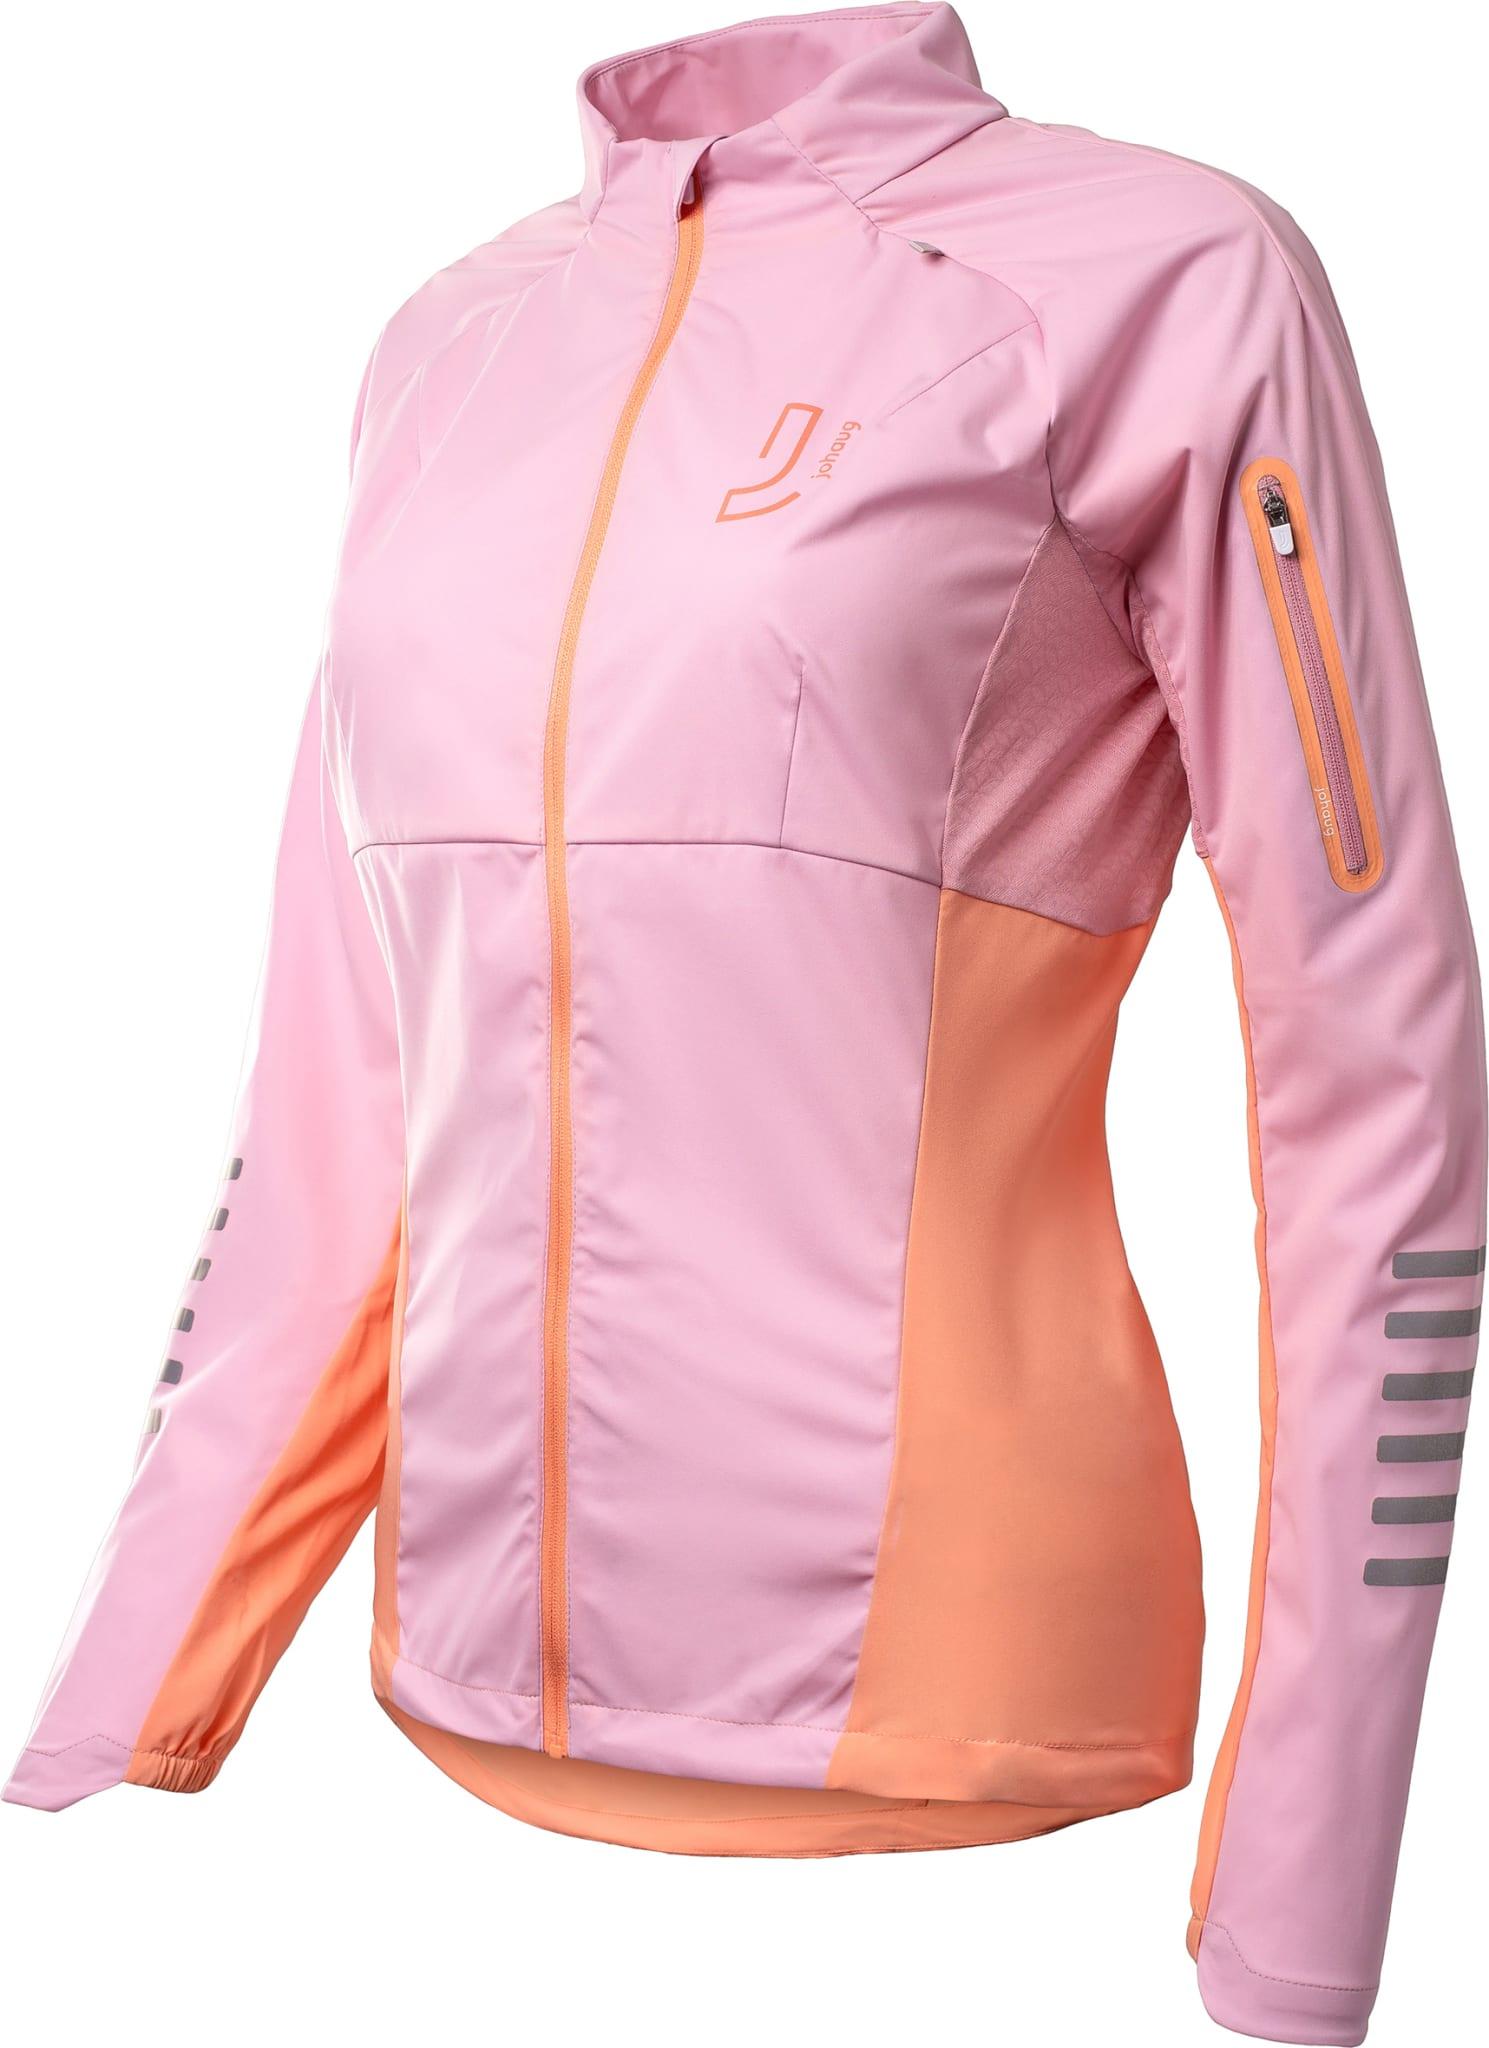 Offisiell Kjøpe Billige Nike Air Zoom Pegasus laow top